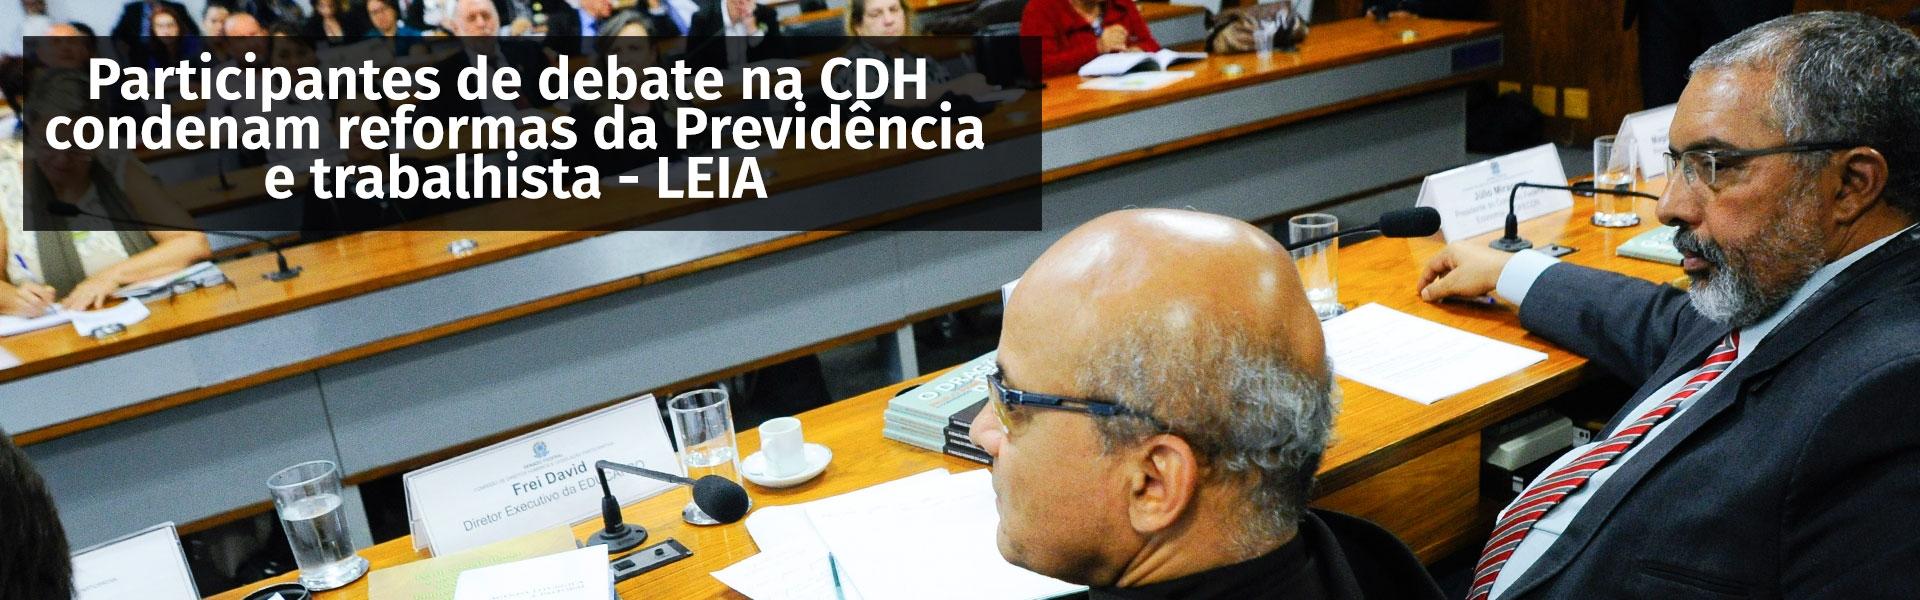 Participantes de debate na CDH condenam reformas da Previdência e trabalhista